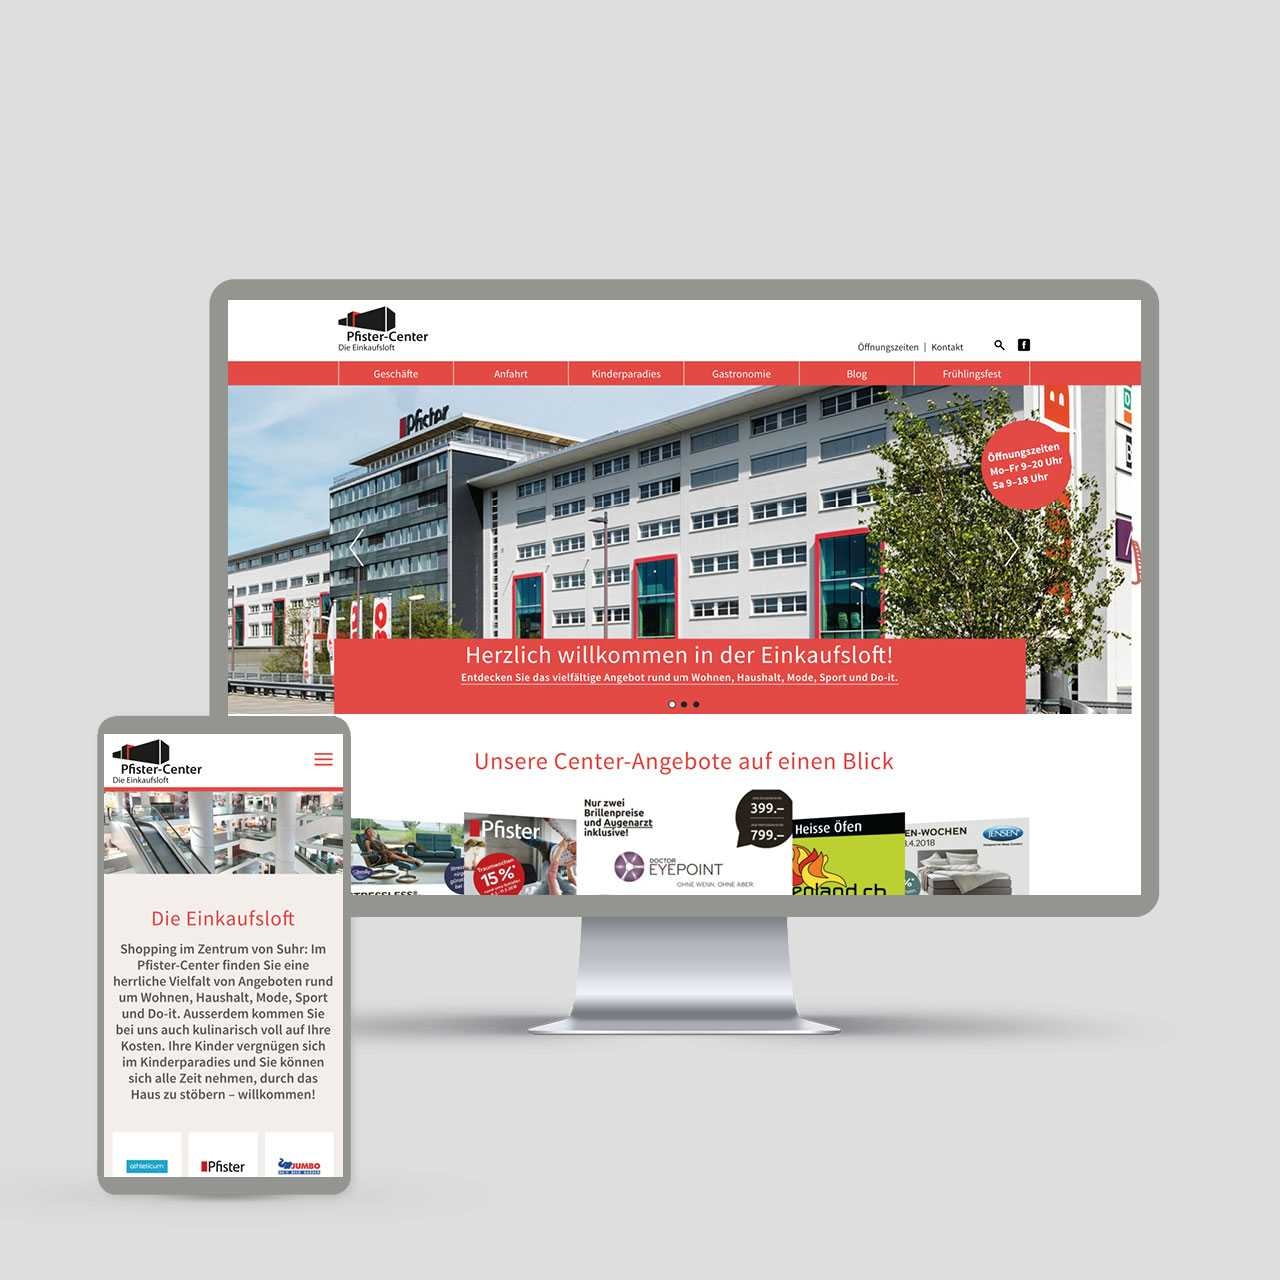 Pfister-Center Suhr: Redesign Website